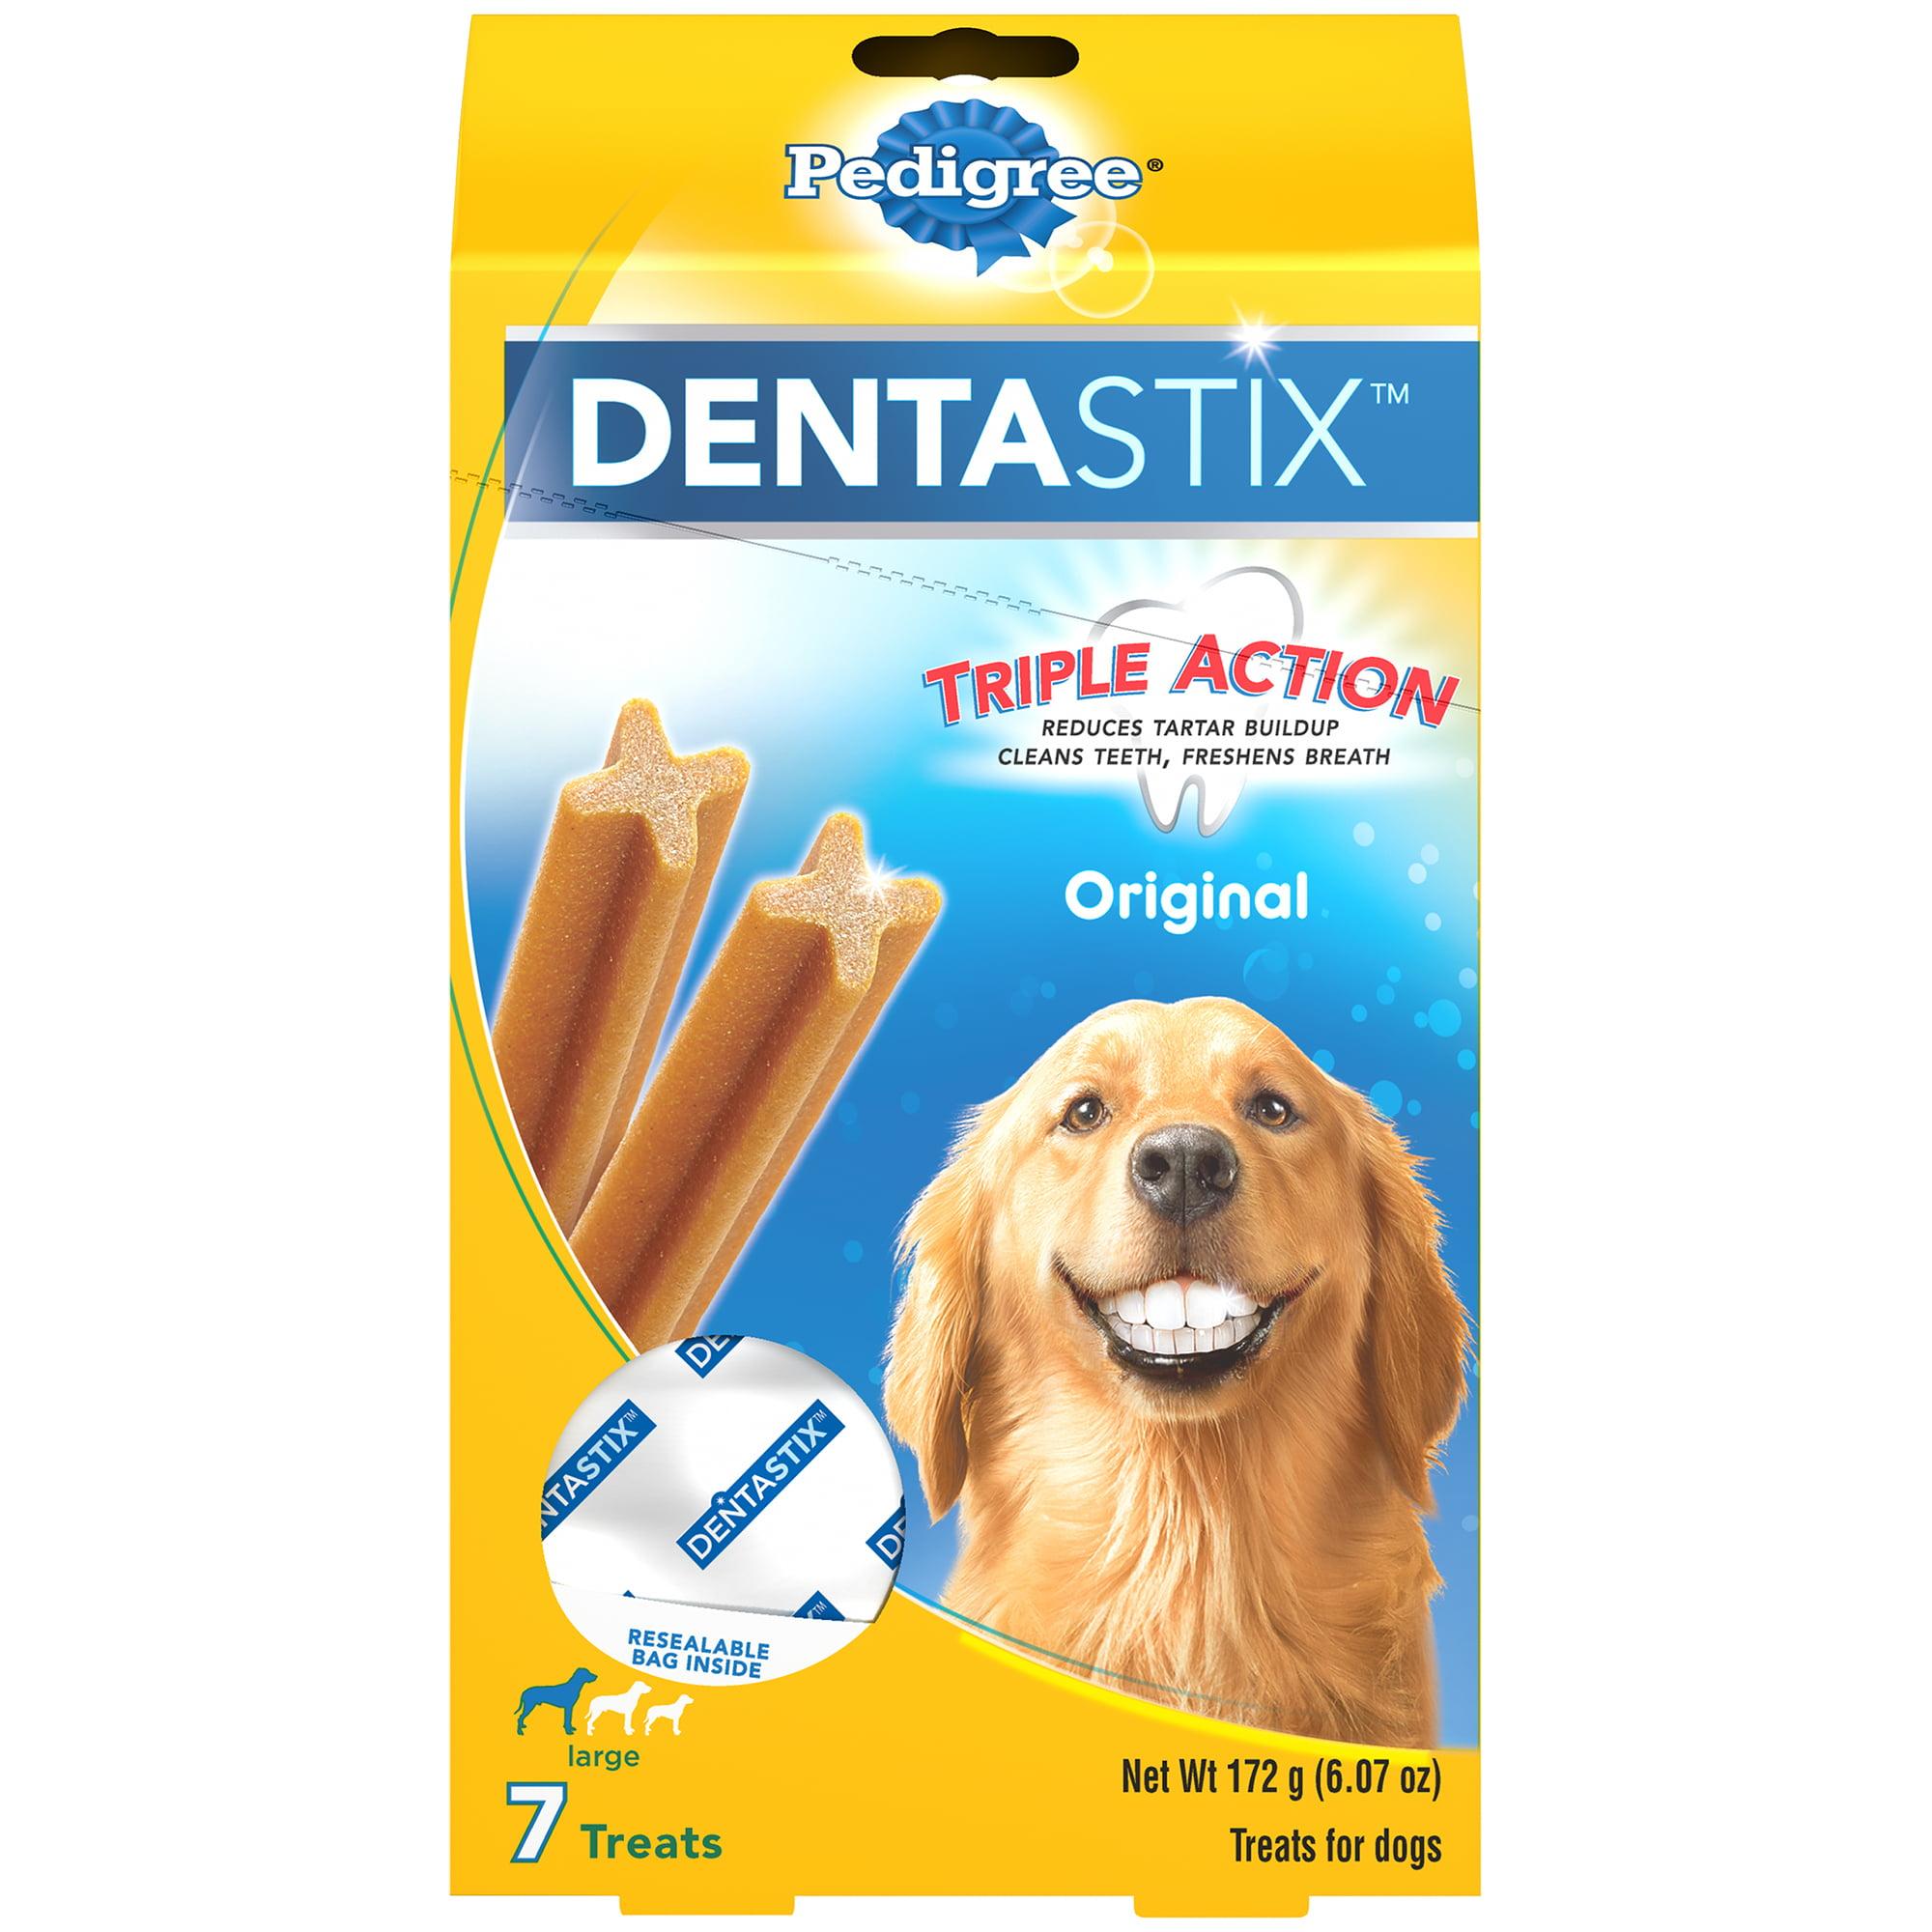 PEDIGREE DENTASTIX Large Dental Dog Treats Original, 6.07 oz. (7 Treats)